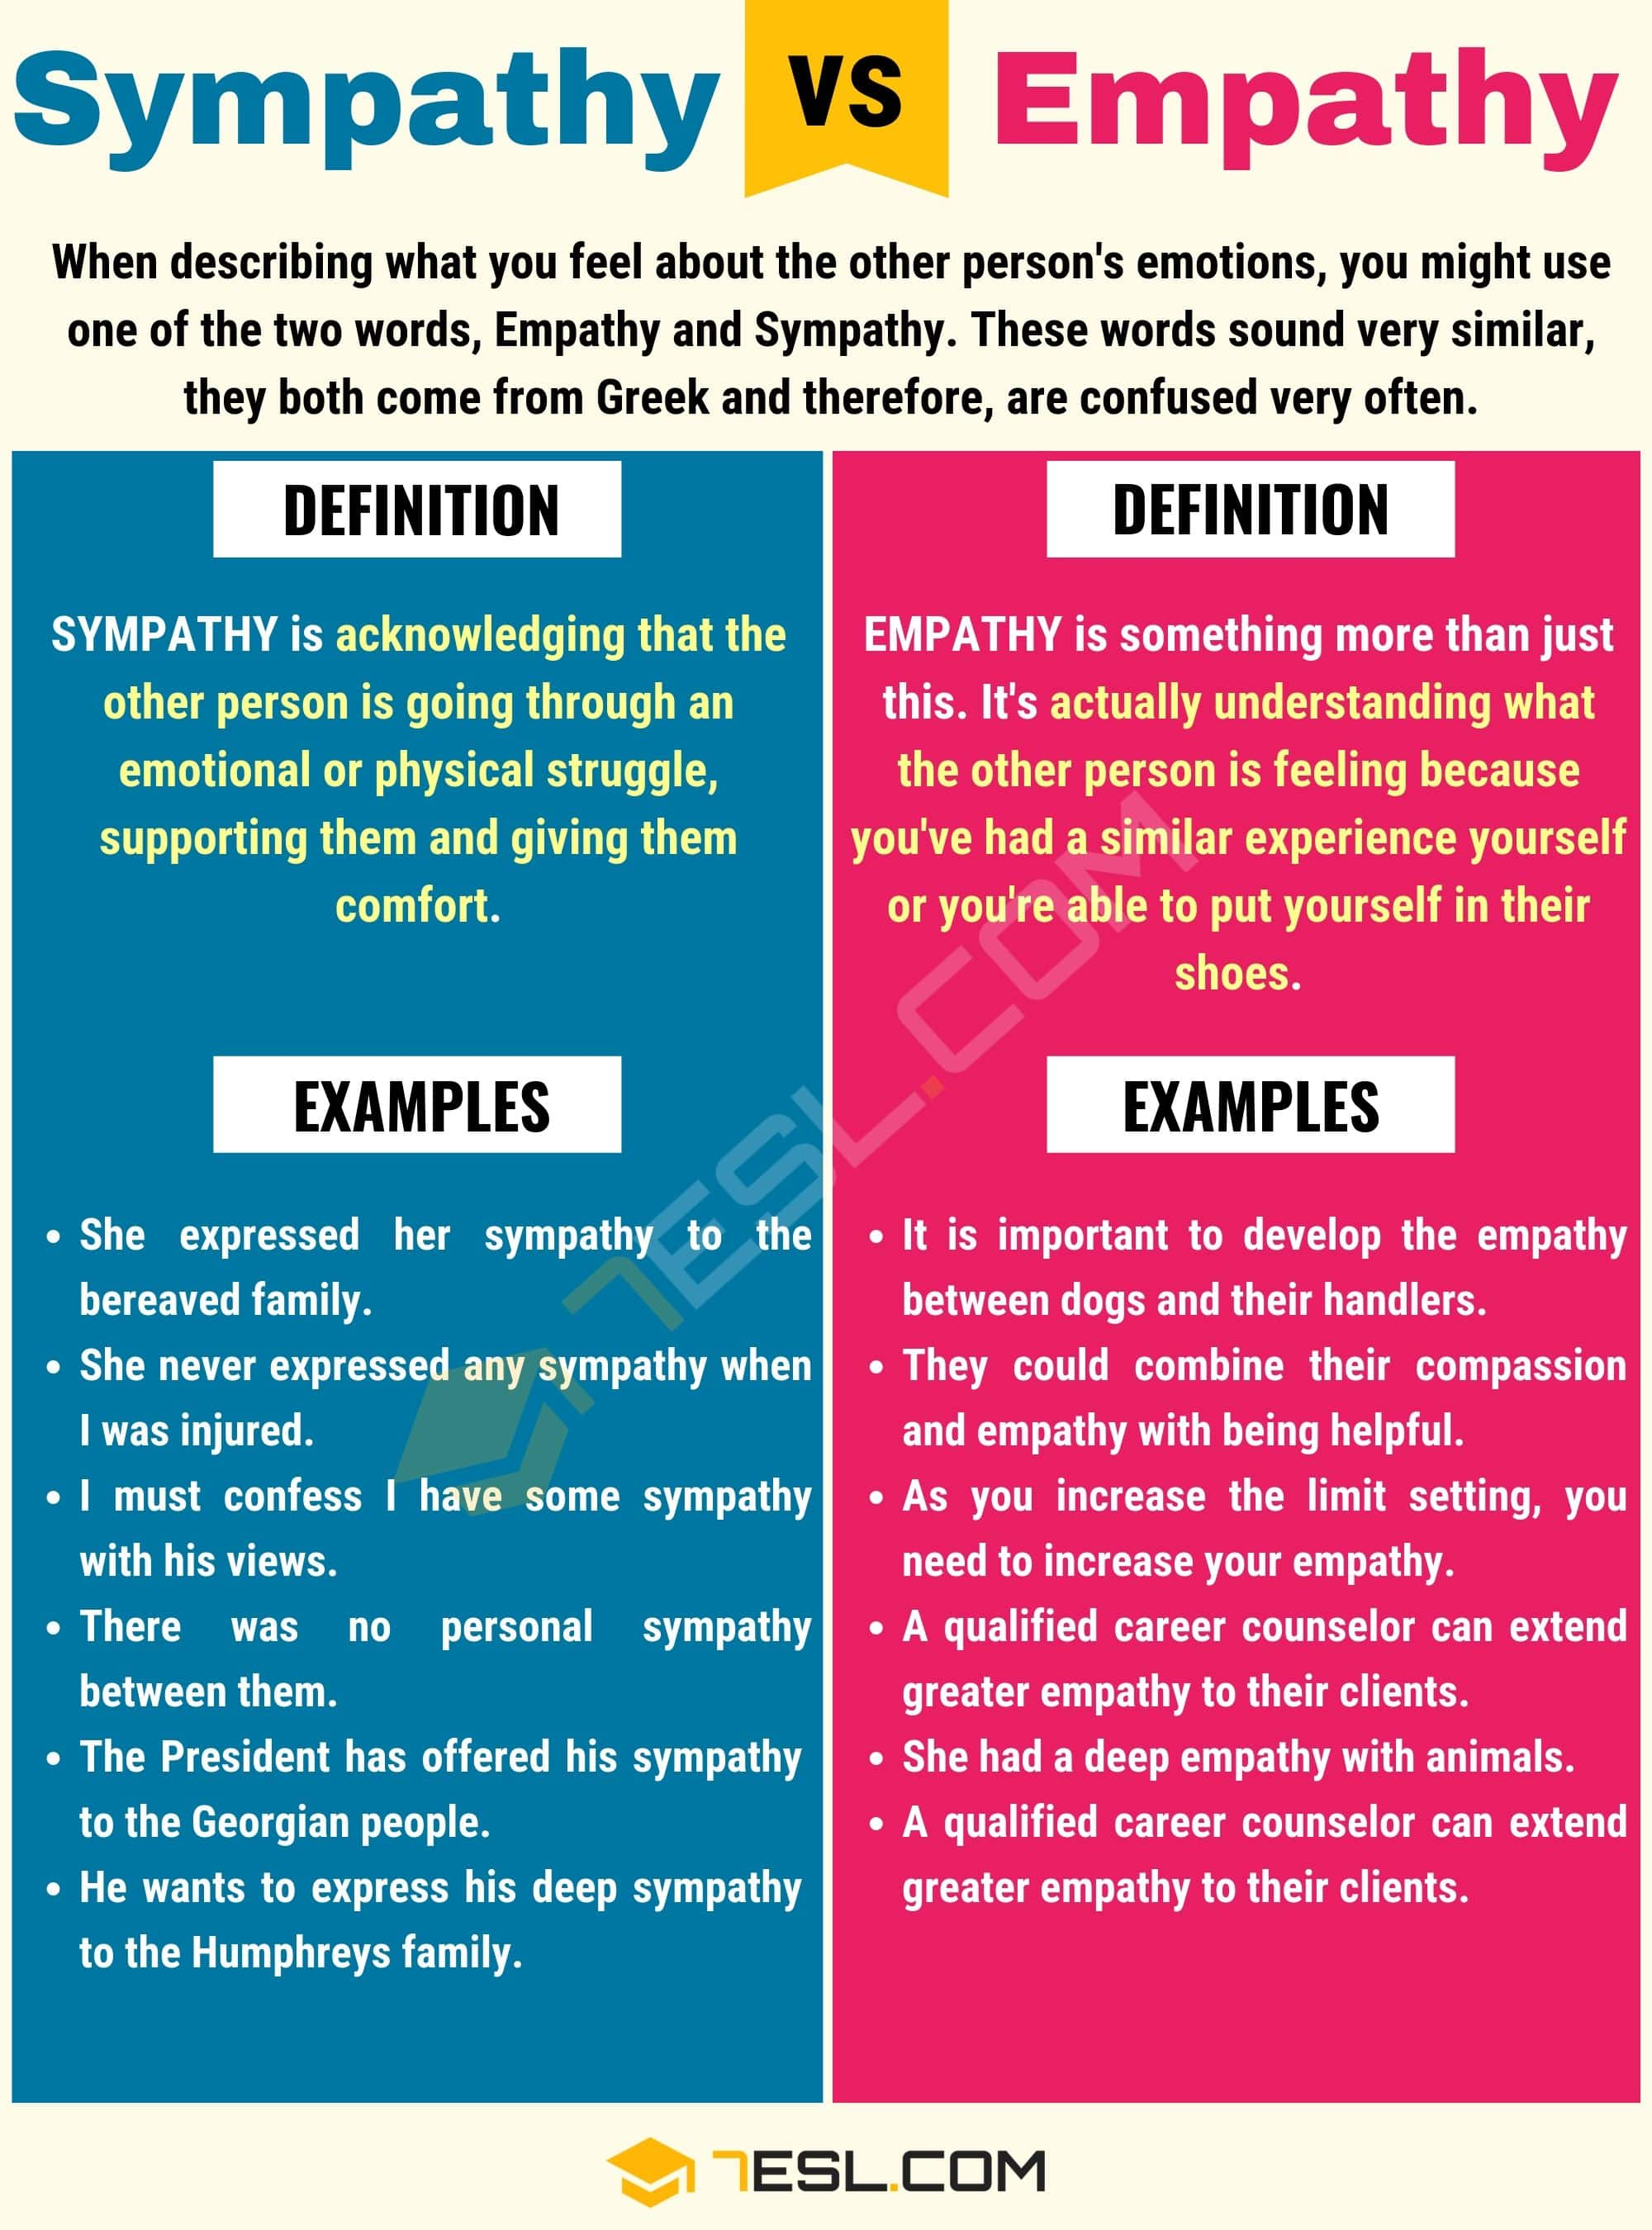 Empathy Vs Sympathy How To Use Sympathy Vs Empathy In